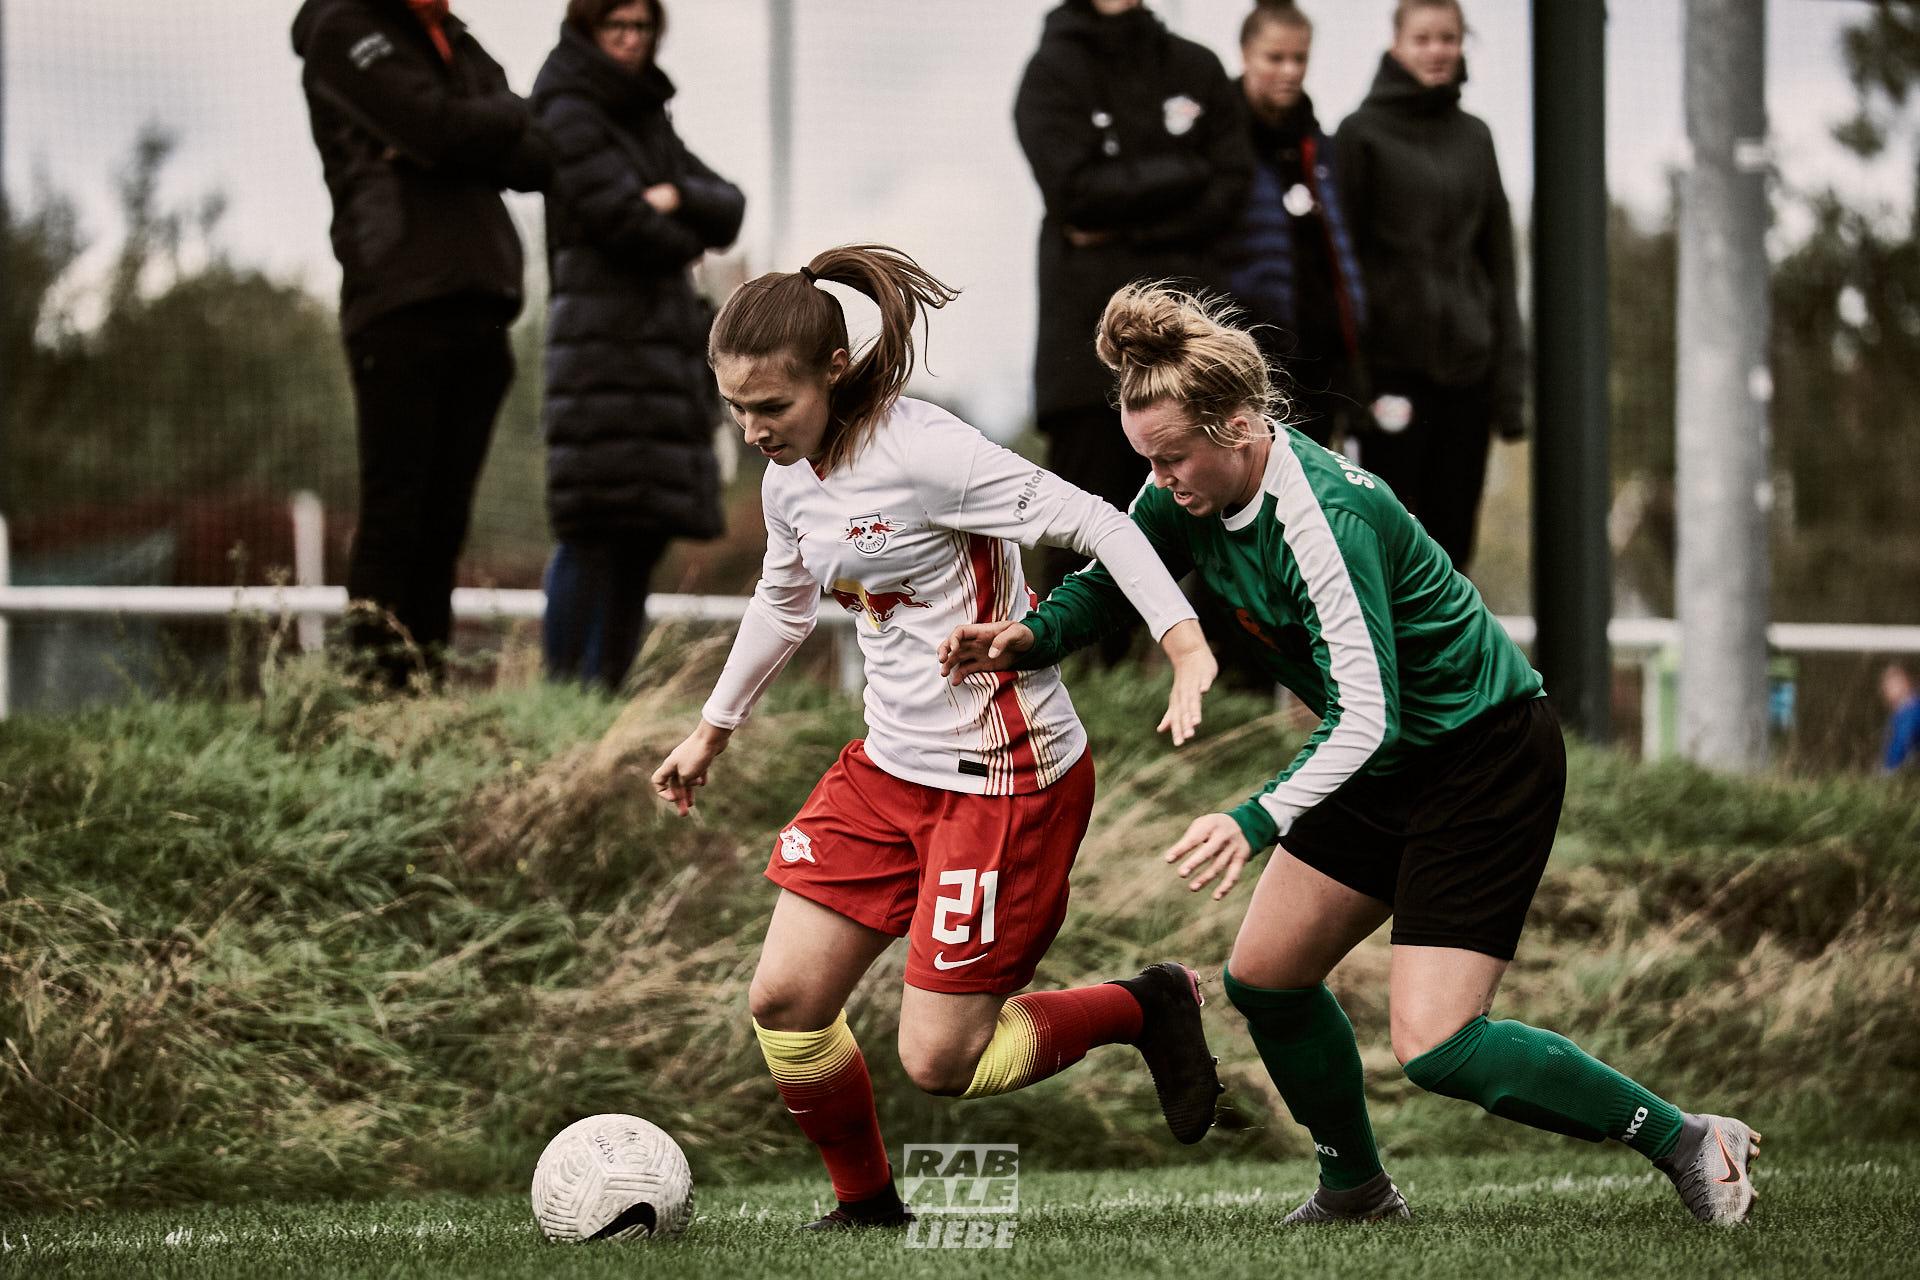 Regionalliga: RB Leipzig U23w -vs- SV Eintracht Leipzig-Süd